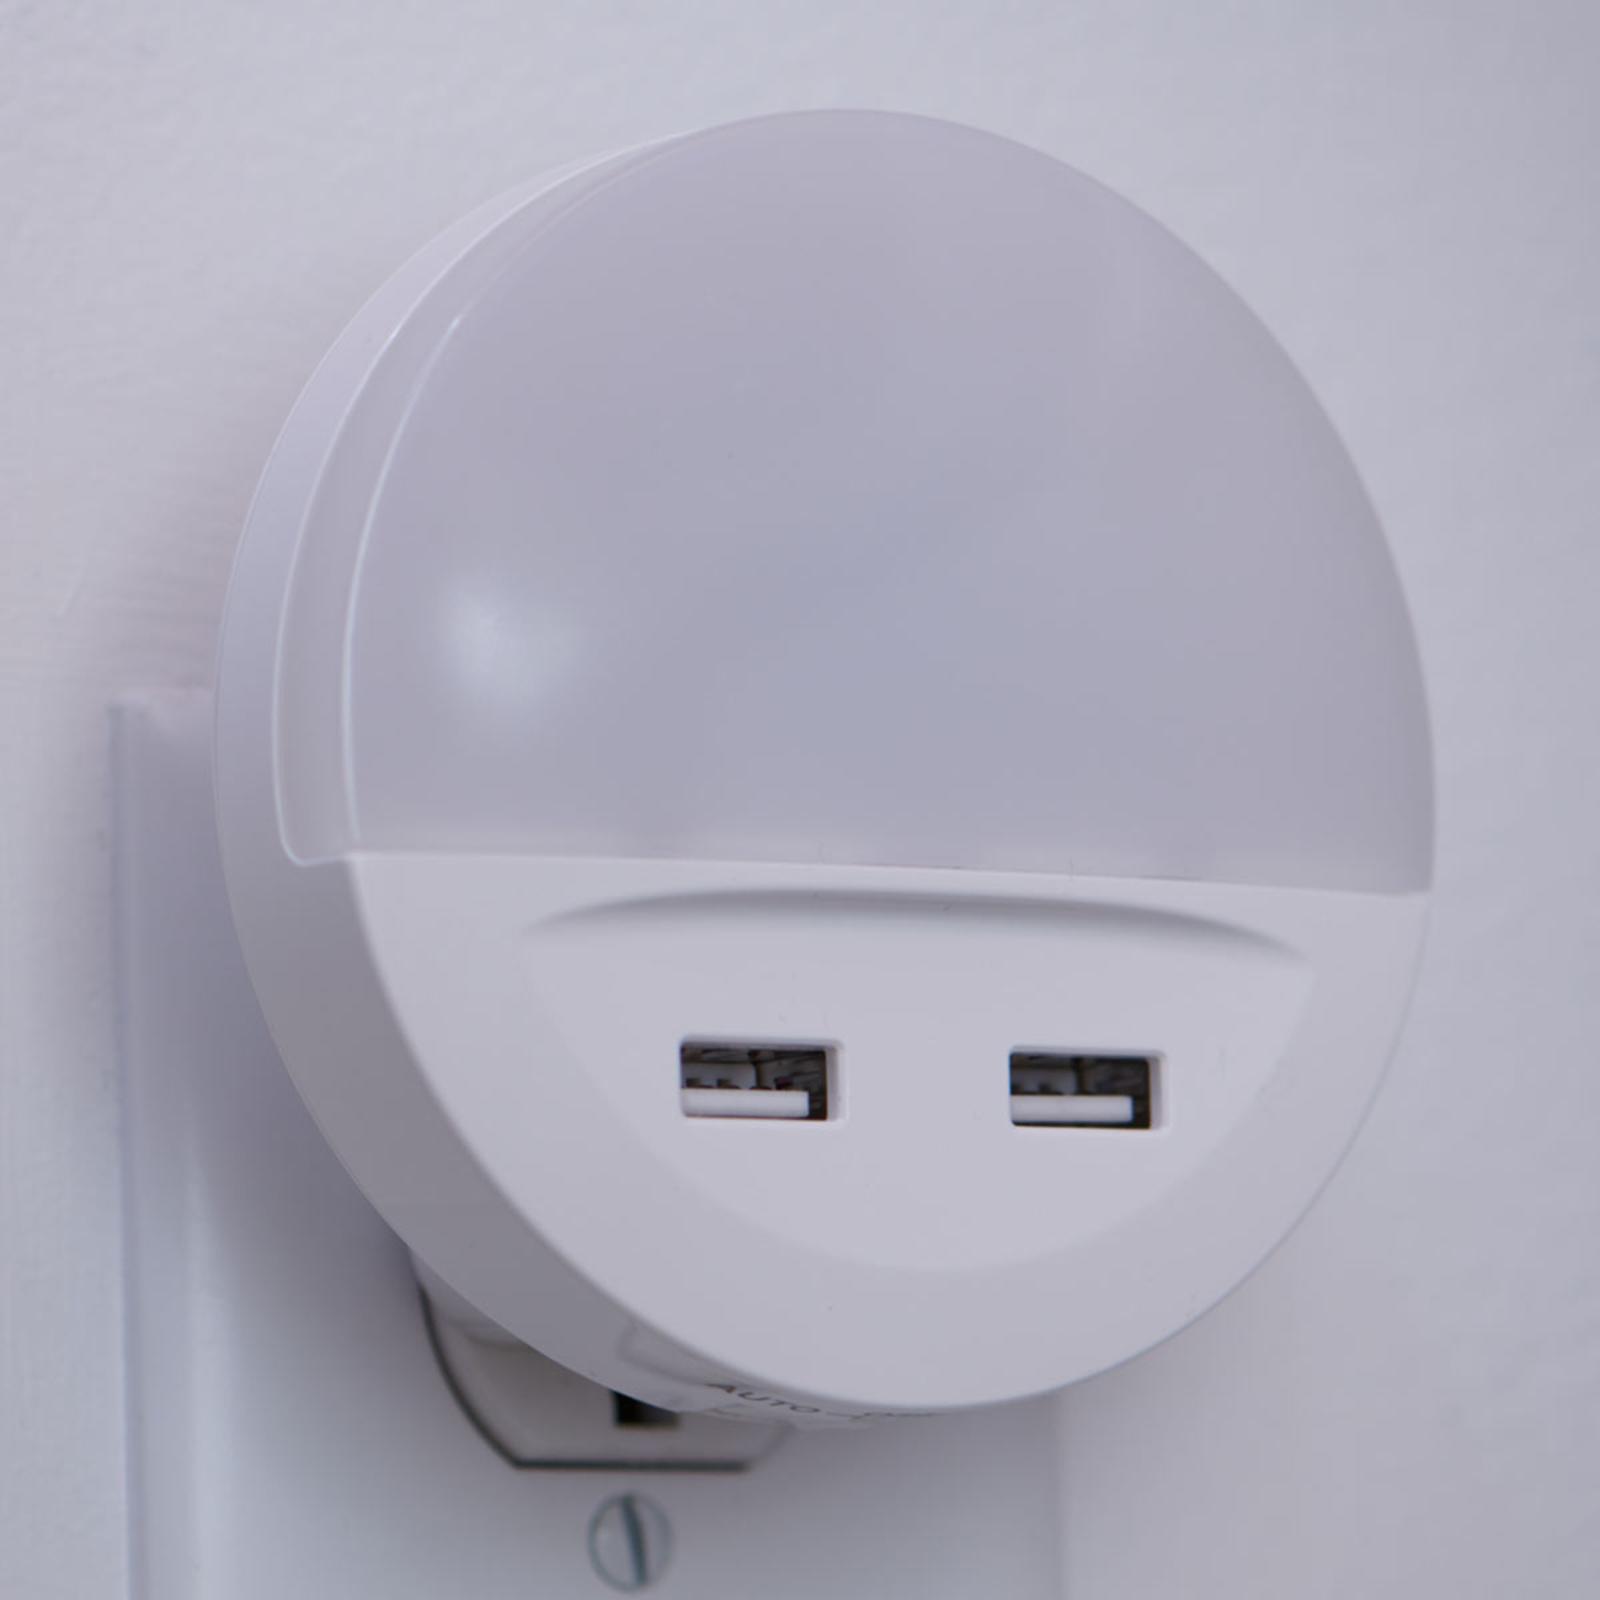 LEDVANCE Lunetta USB LED-Nachtlicht mit USB-Port